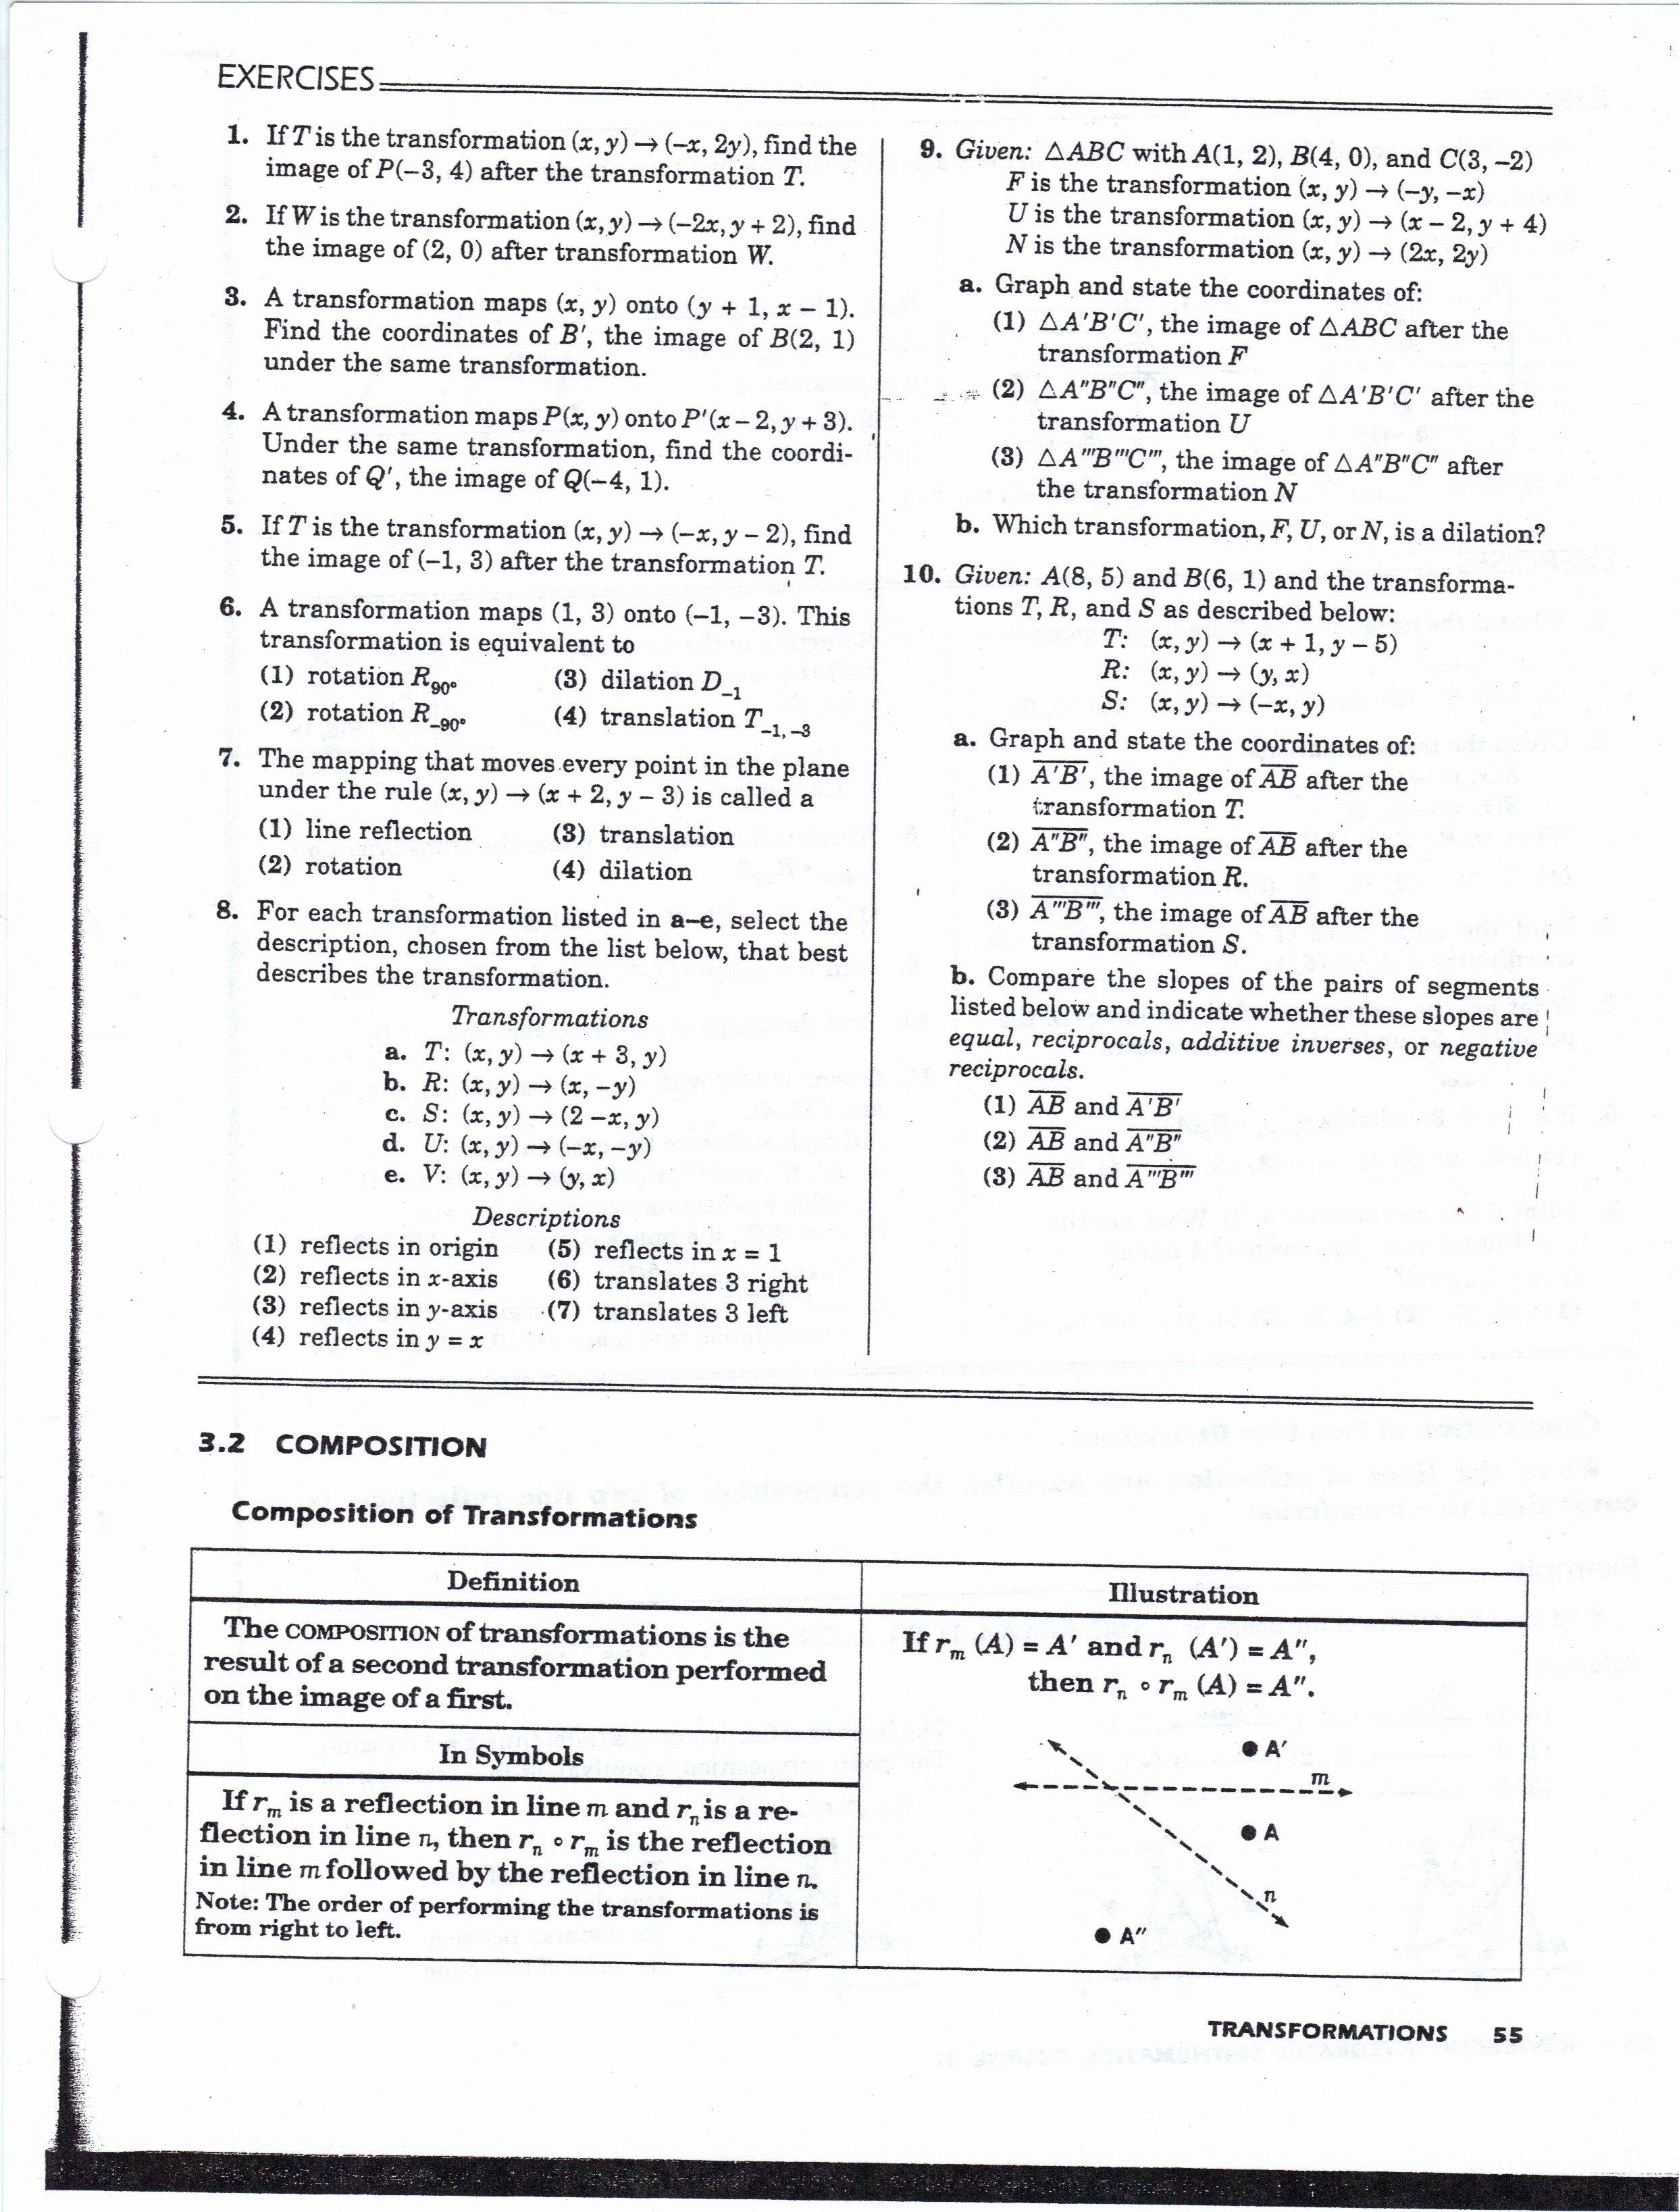 Geometry Worksheet Kites and Trapezoids Luxury Trapezoids and Kites Worksheet